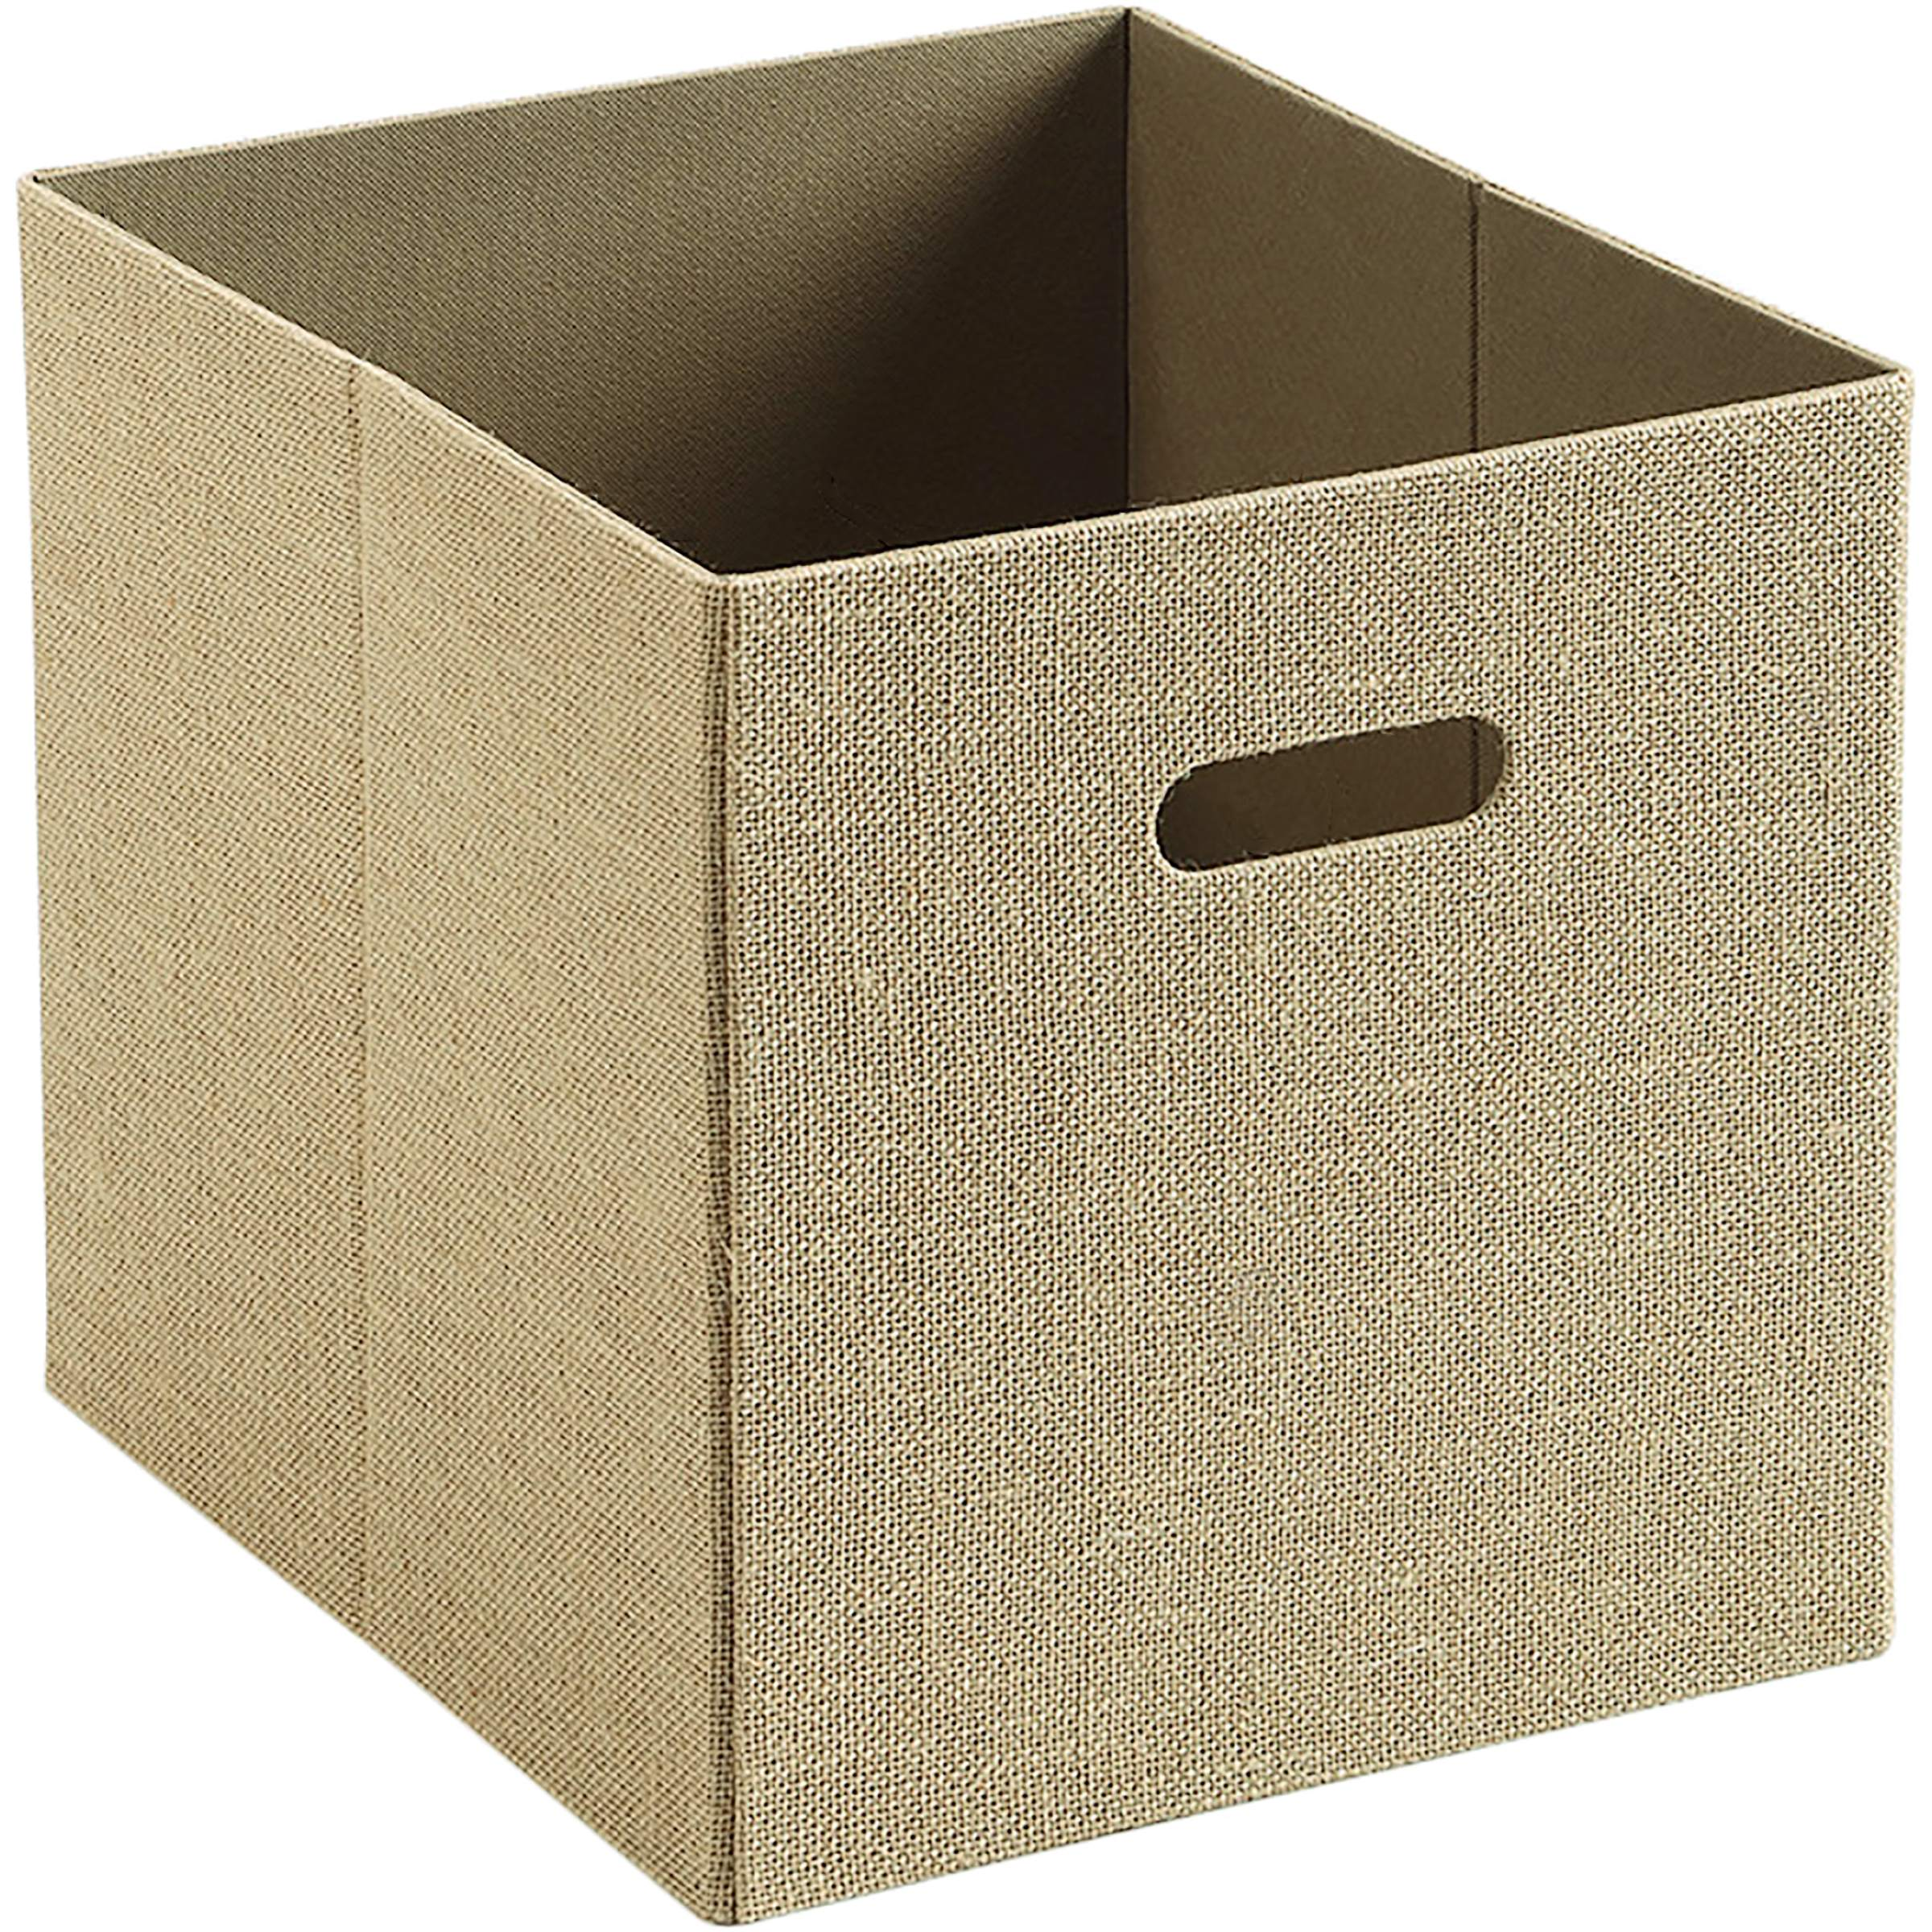 Better Homes and Gardens® Burlap Storage Bin, Rustic Tan Exterior